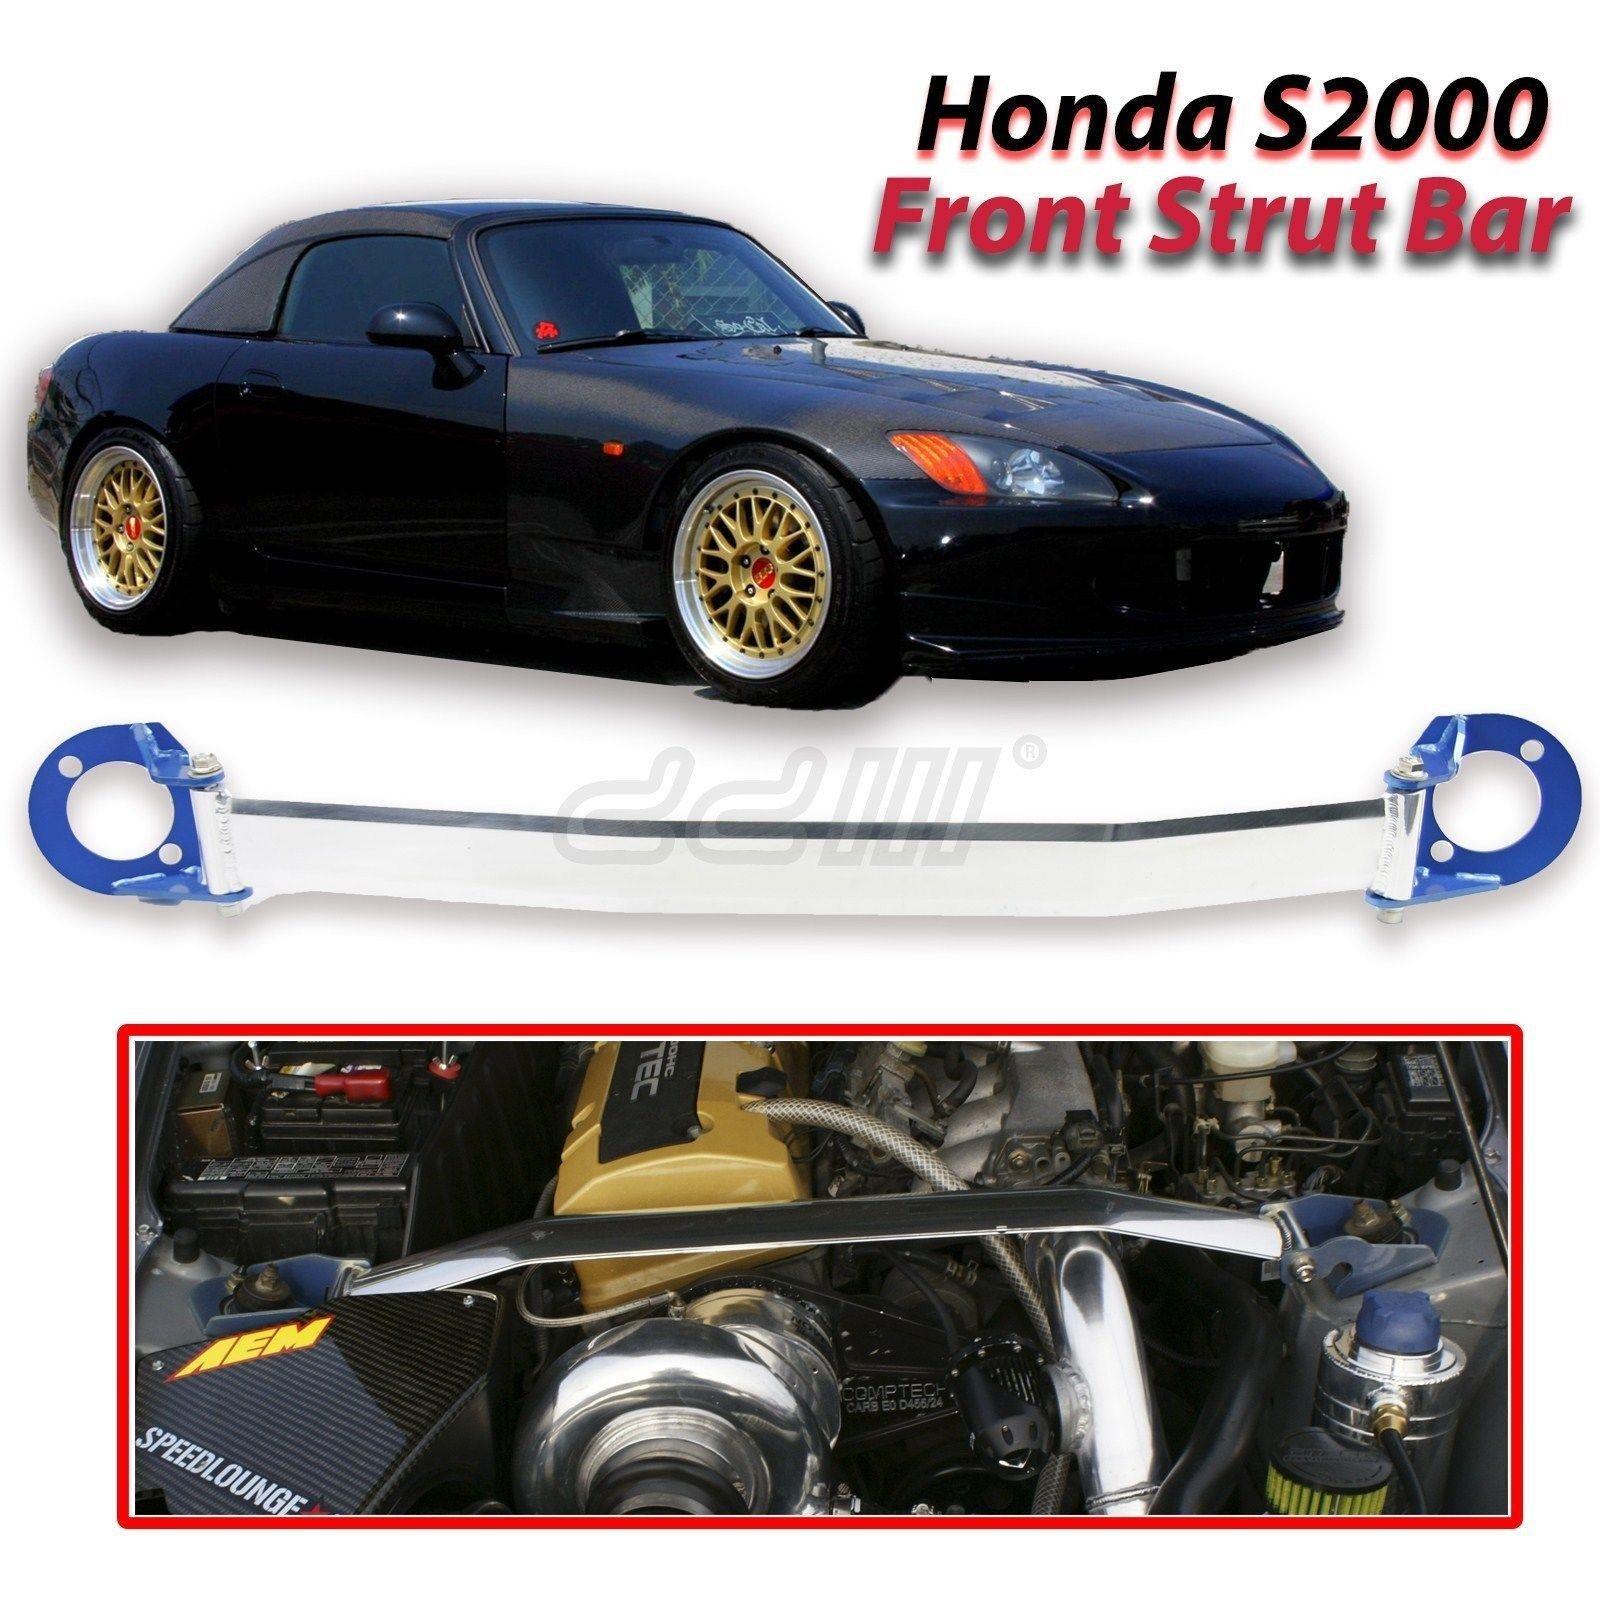 1 Pcs Racing Front Strut Bar Brace similar CUSCO Design For HONDA S2000 AP1 2 99-09